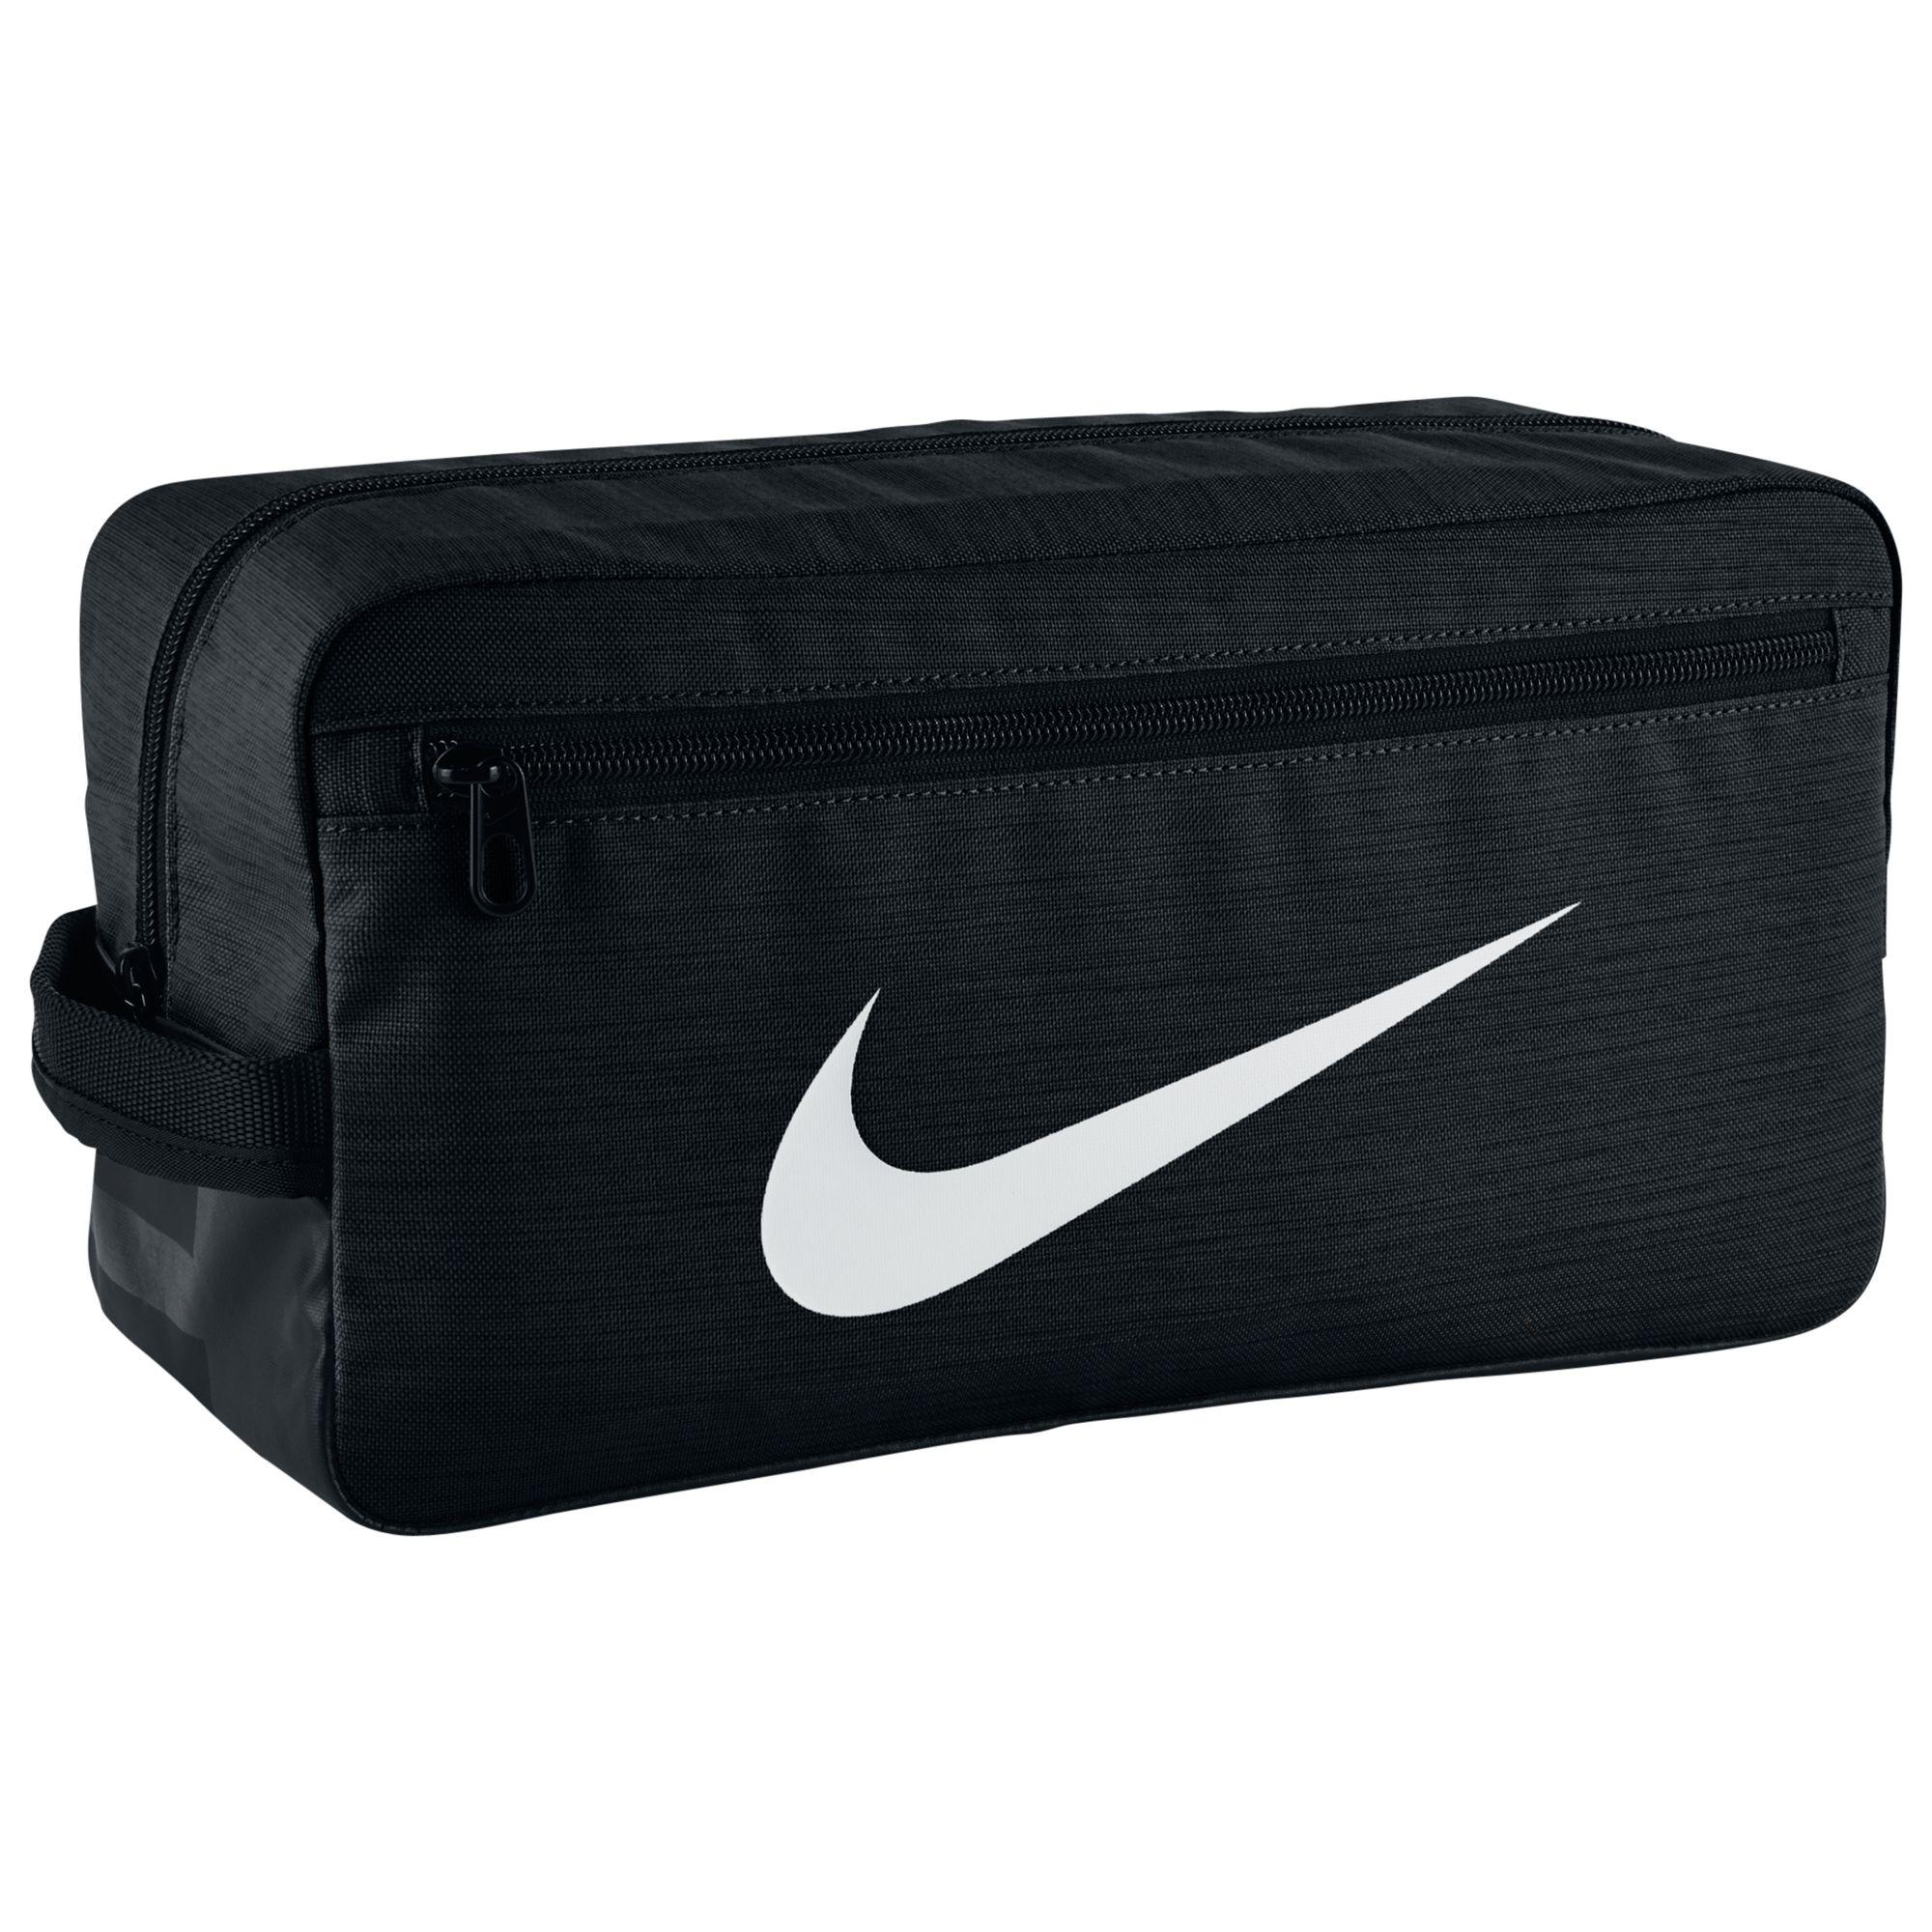 acead15844ab Nike Brasilia Training Shoe Bag